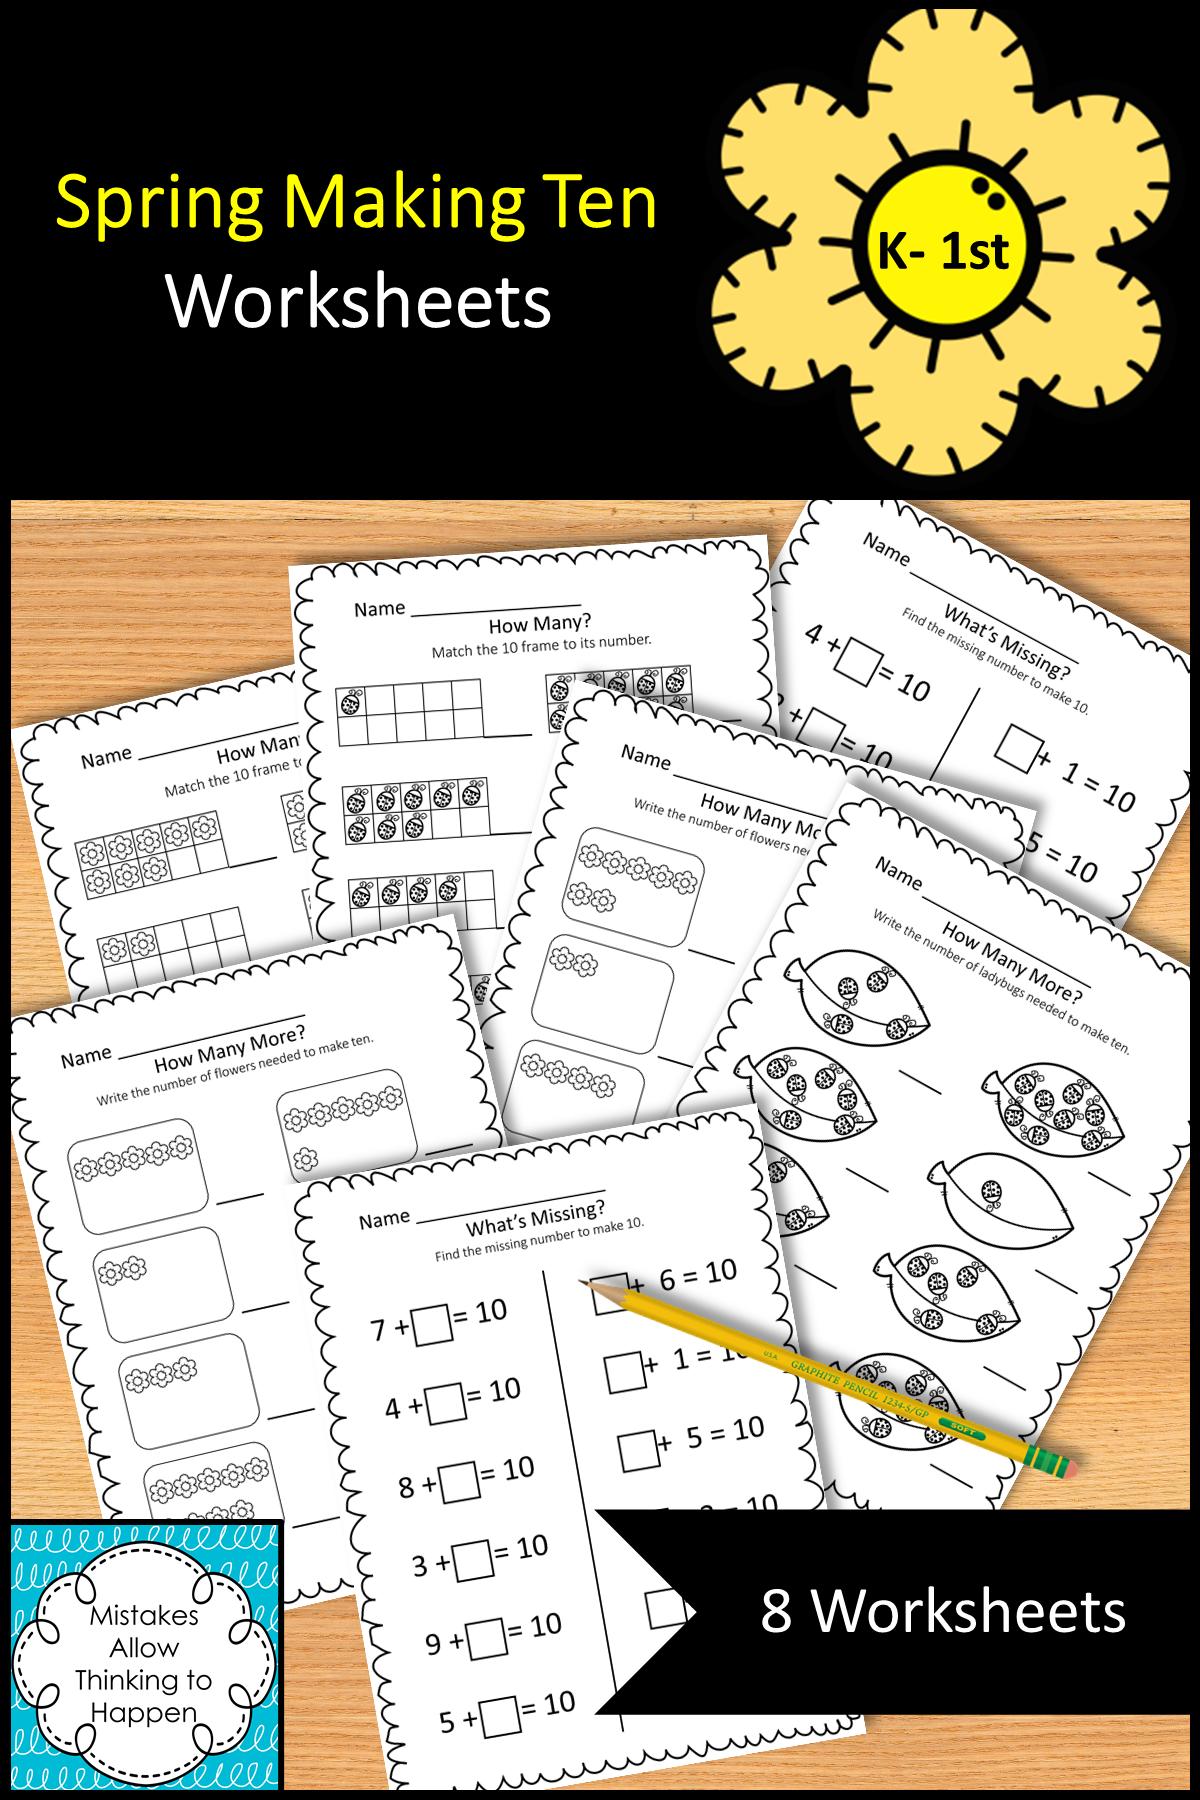 Spring Making Ten Worksheets In